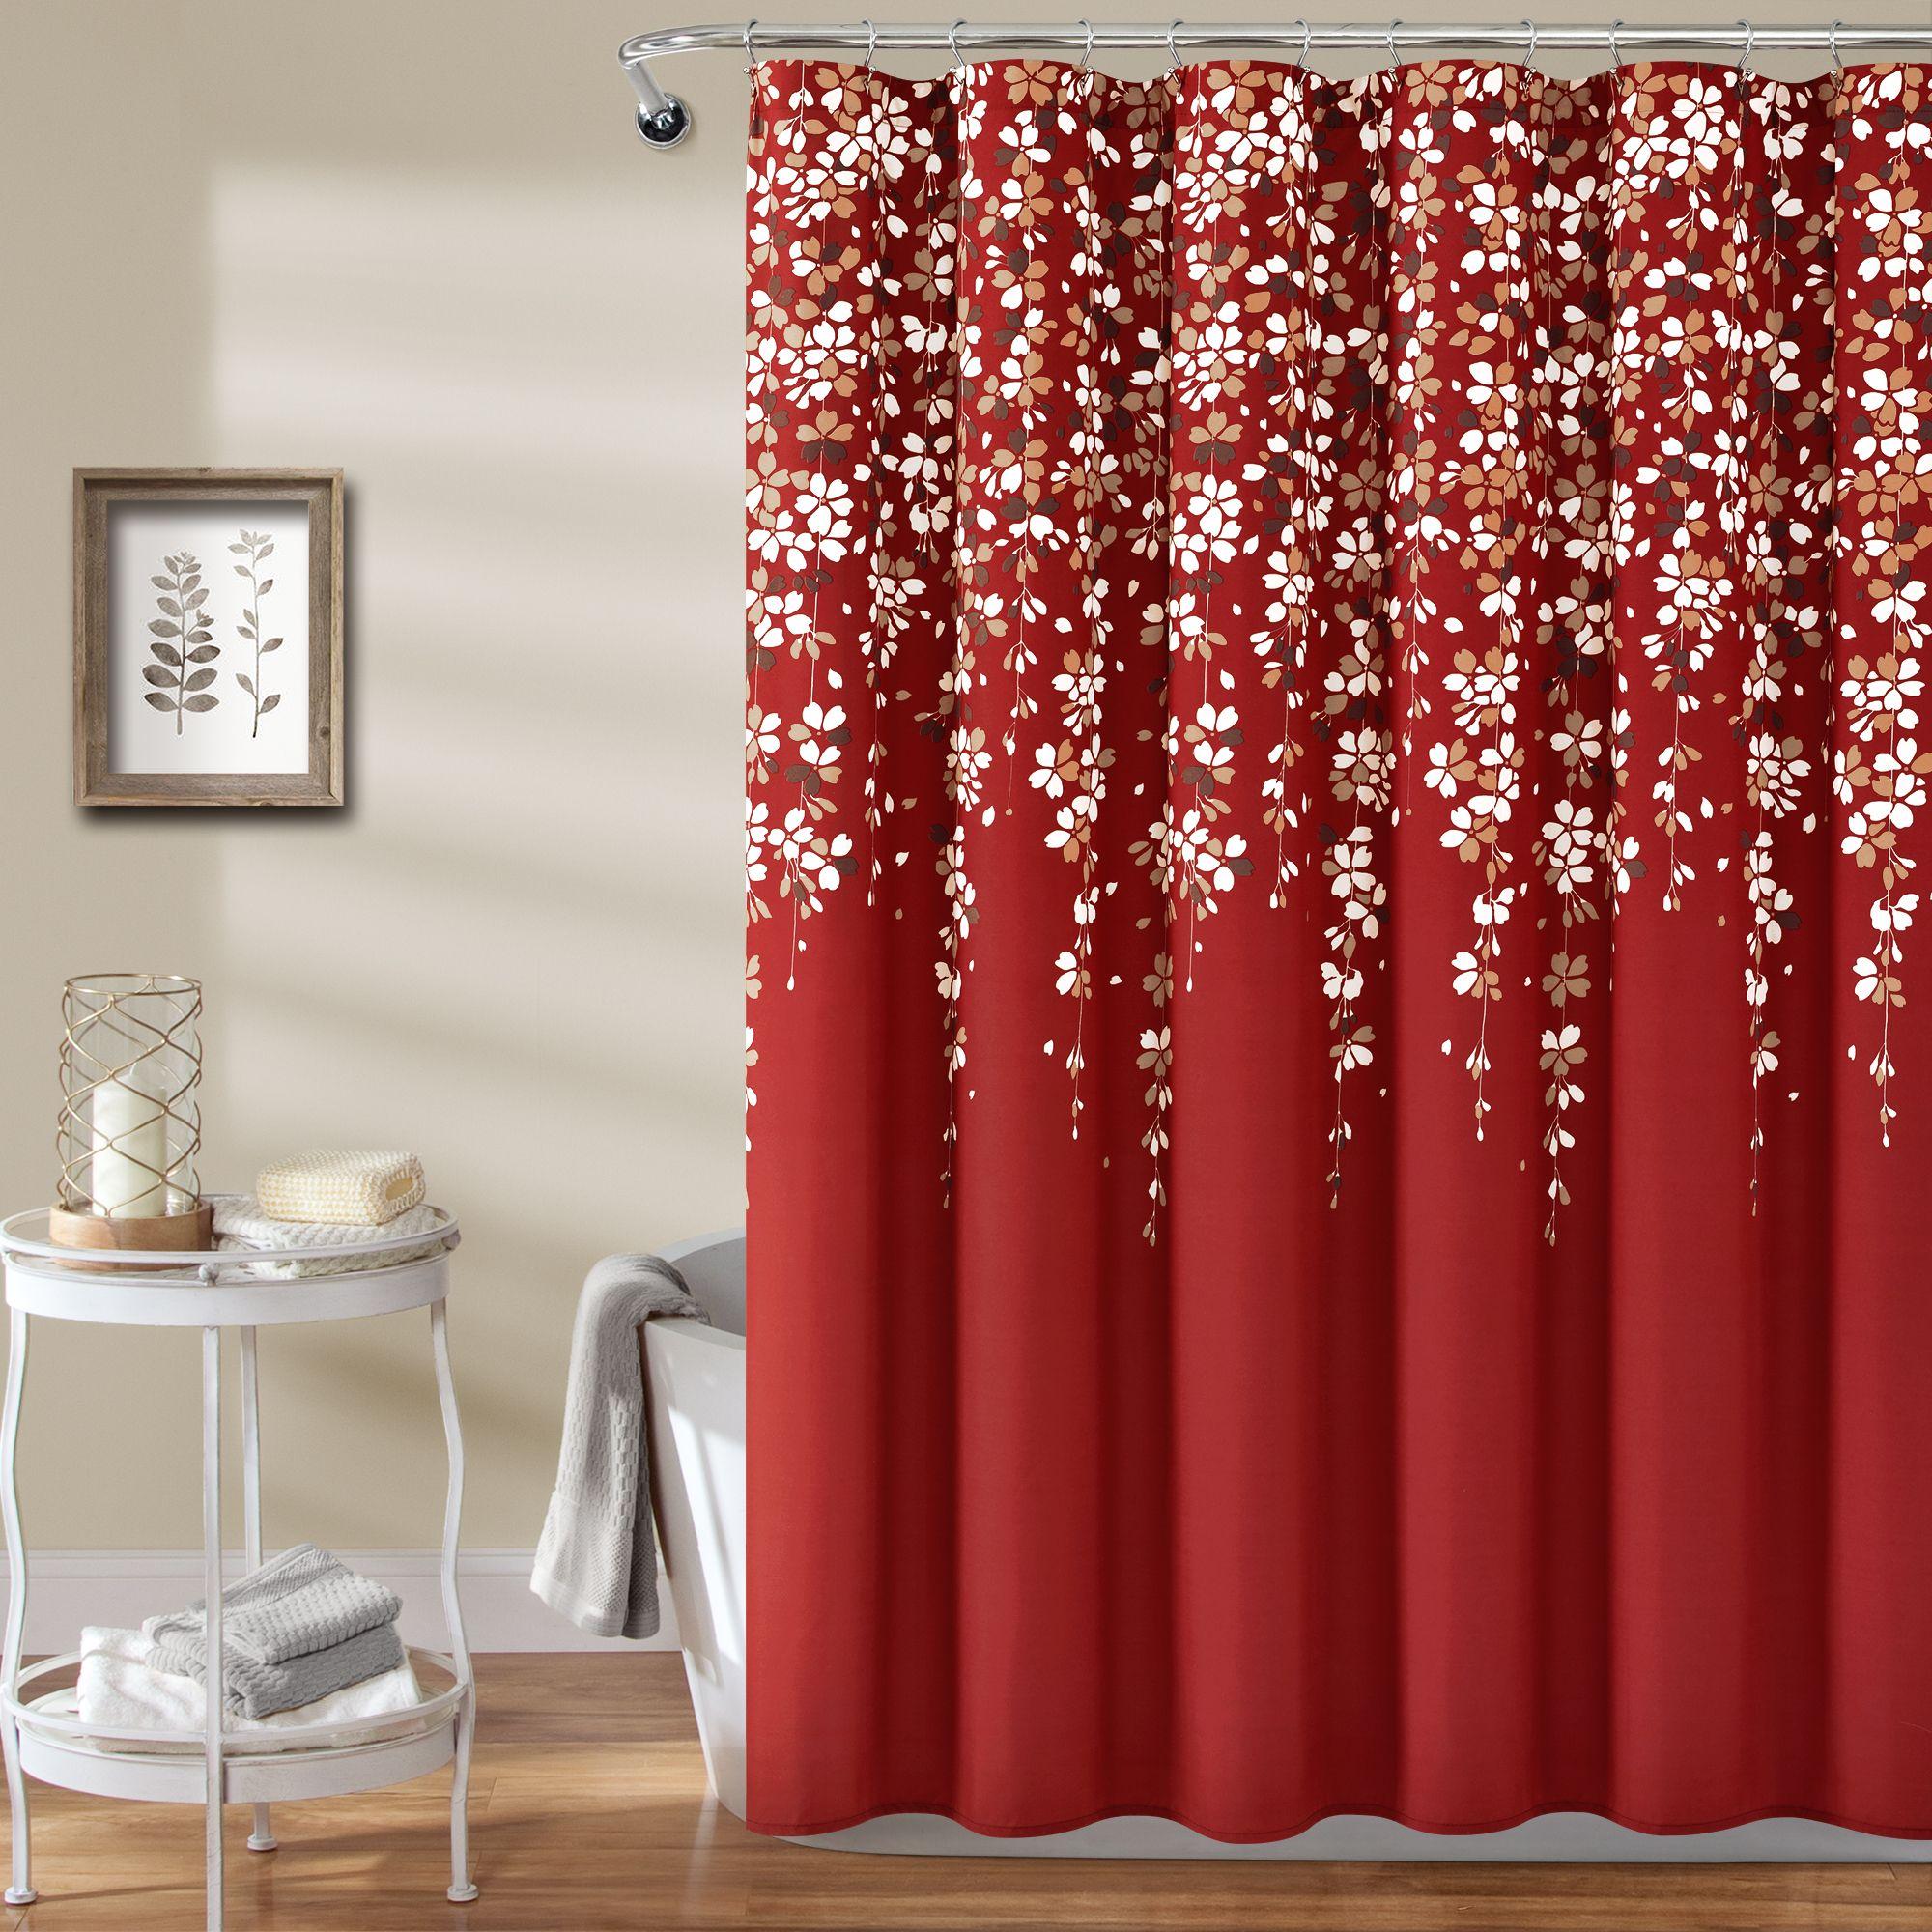 Weeping Flower Shower Curtain In 2020 Flower Shower Curtain